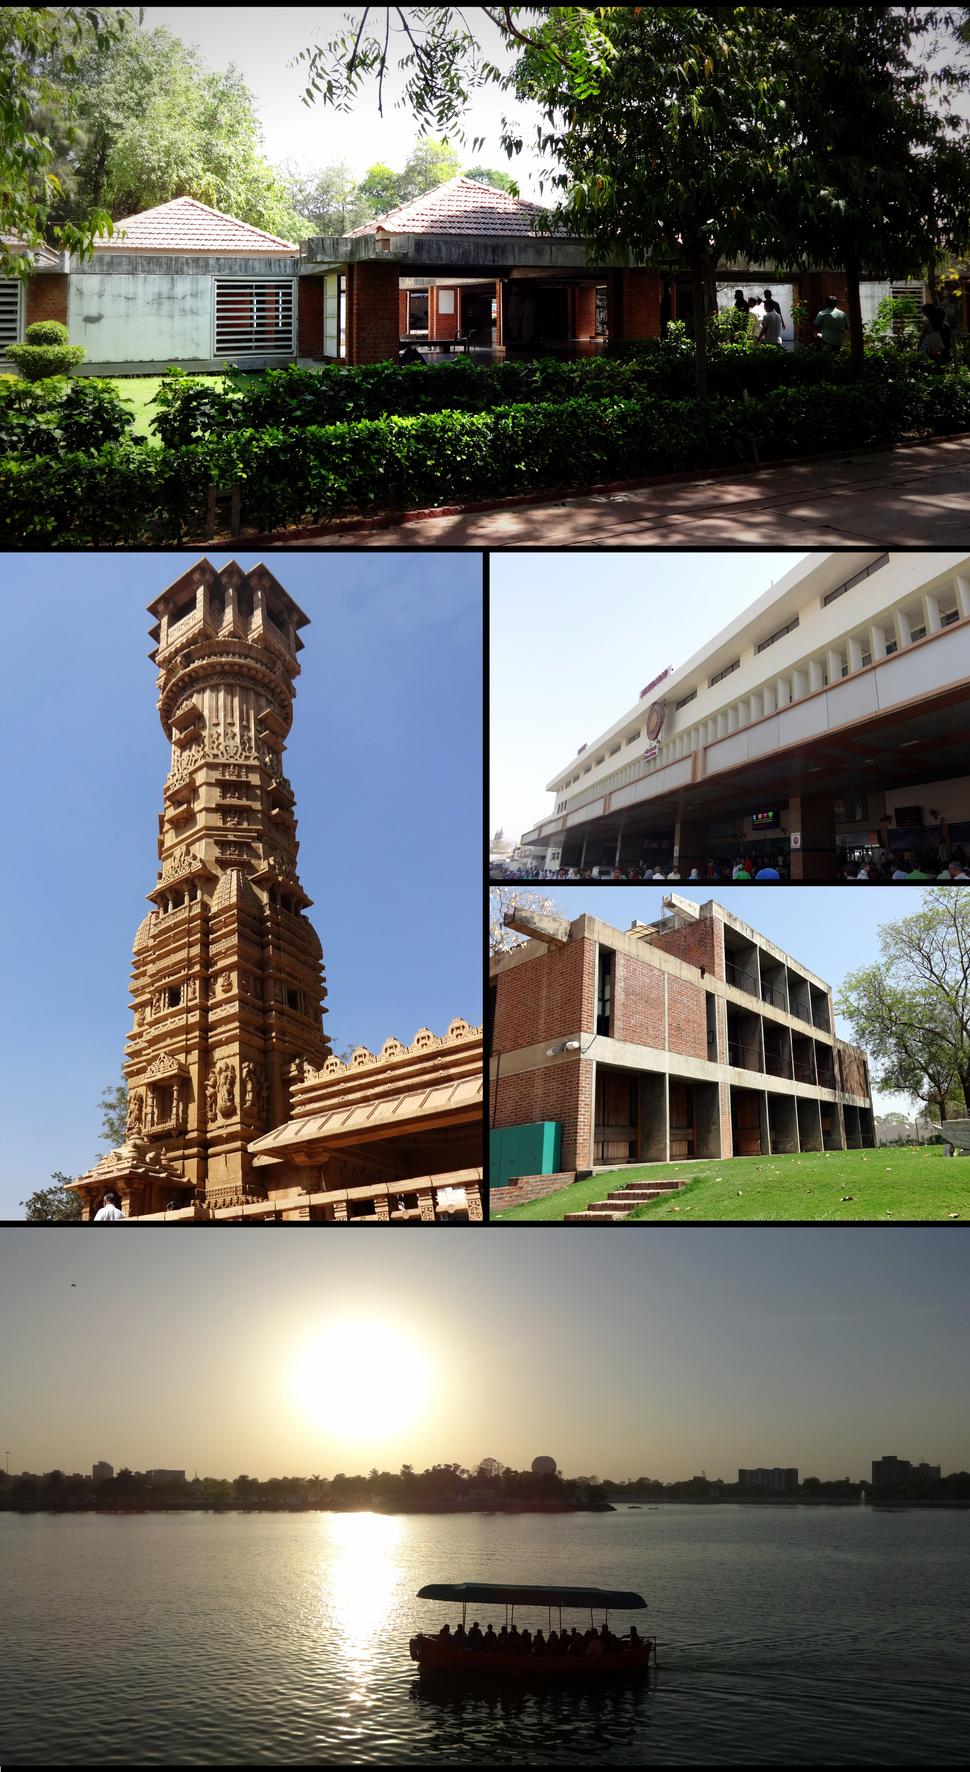 Clockwise from topː Gandhi Smarak Sangrahalay at Sabarmati Ashram, Ahmadabad Railway Station, CEPT University, Kankaria Lake and the Kirti Stambh at Hutheesing Temple